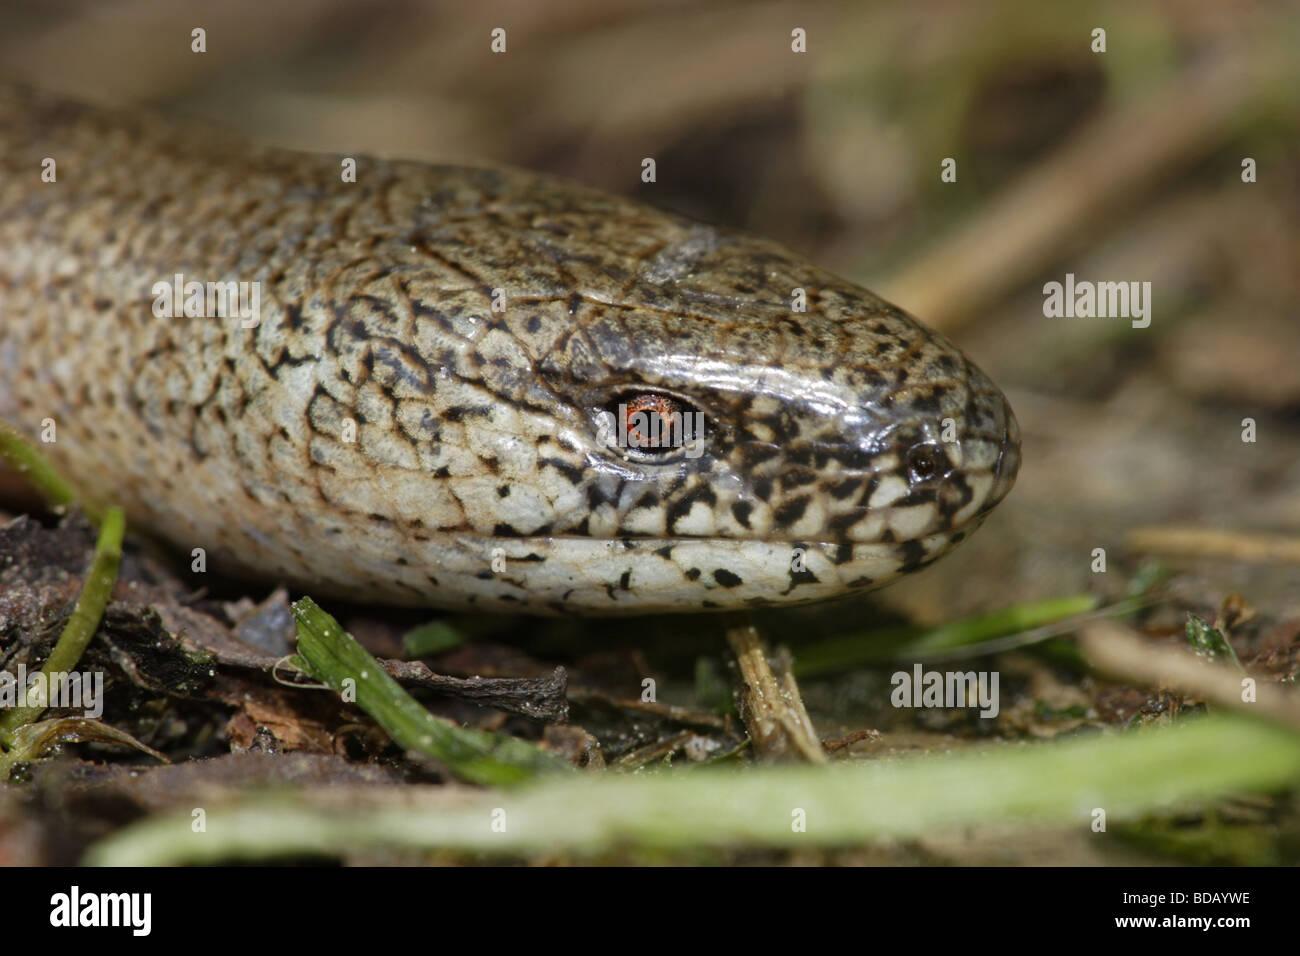 Blindschleiche blindworm (Anguis fragilis) Stock Photo